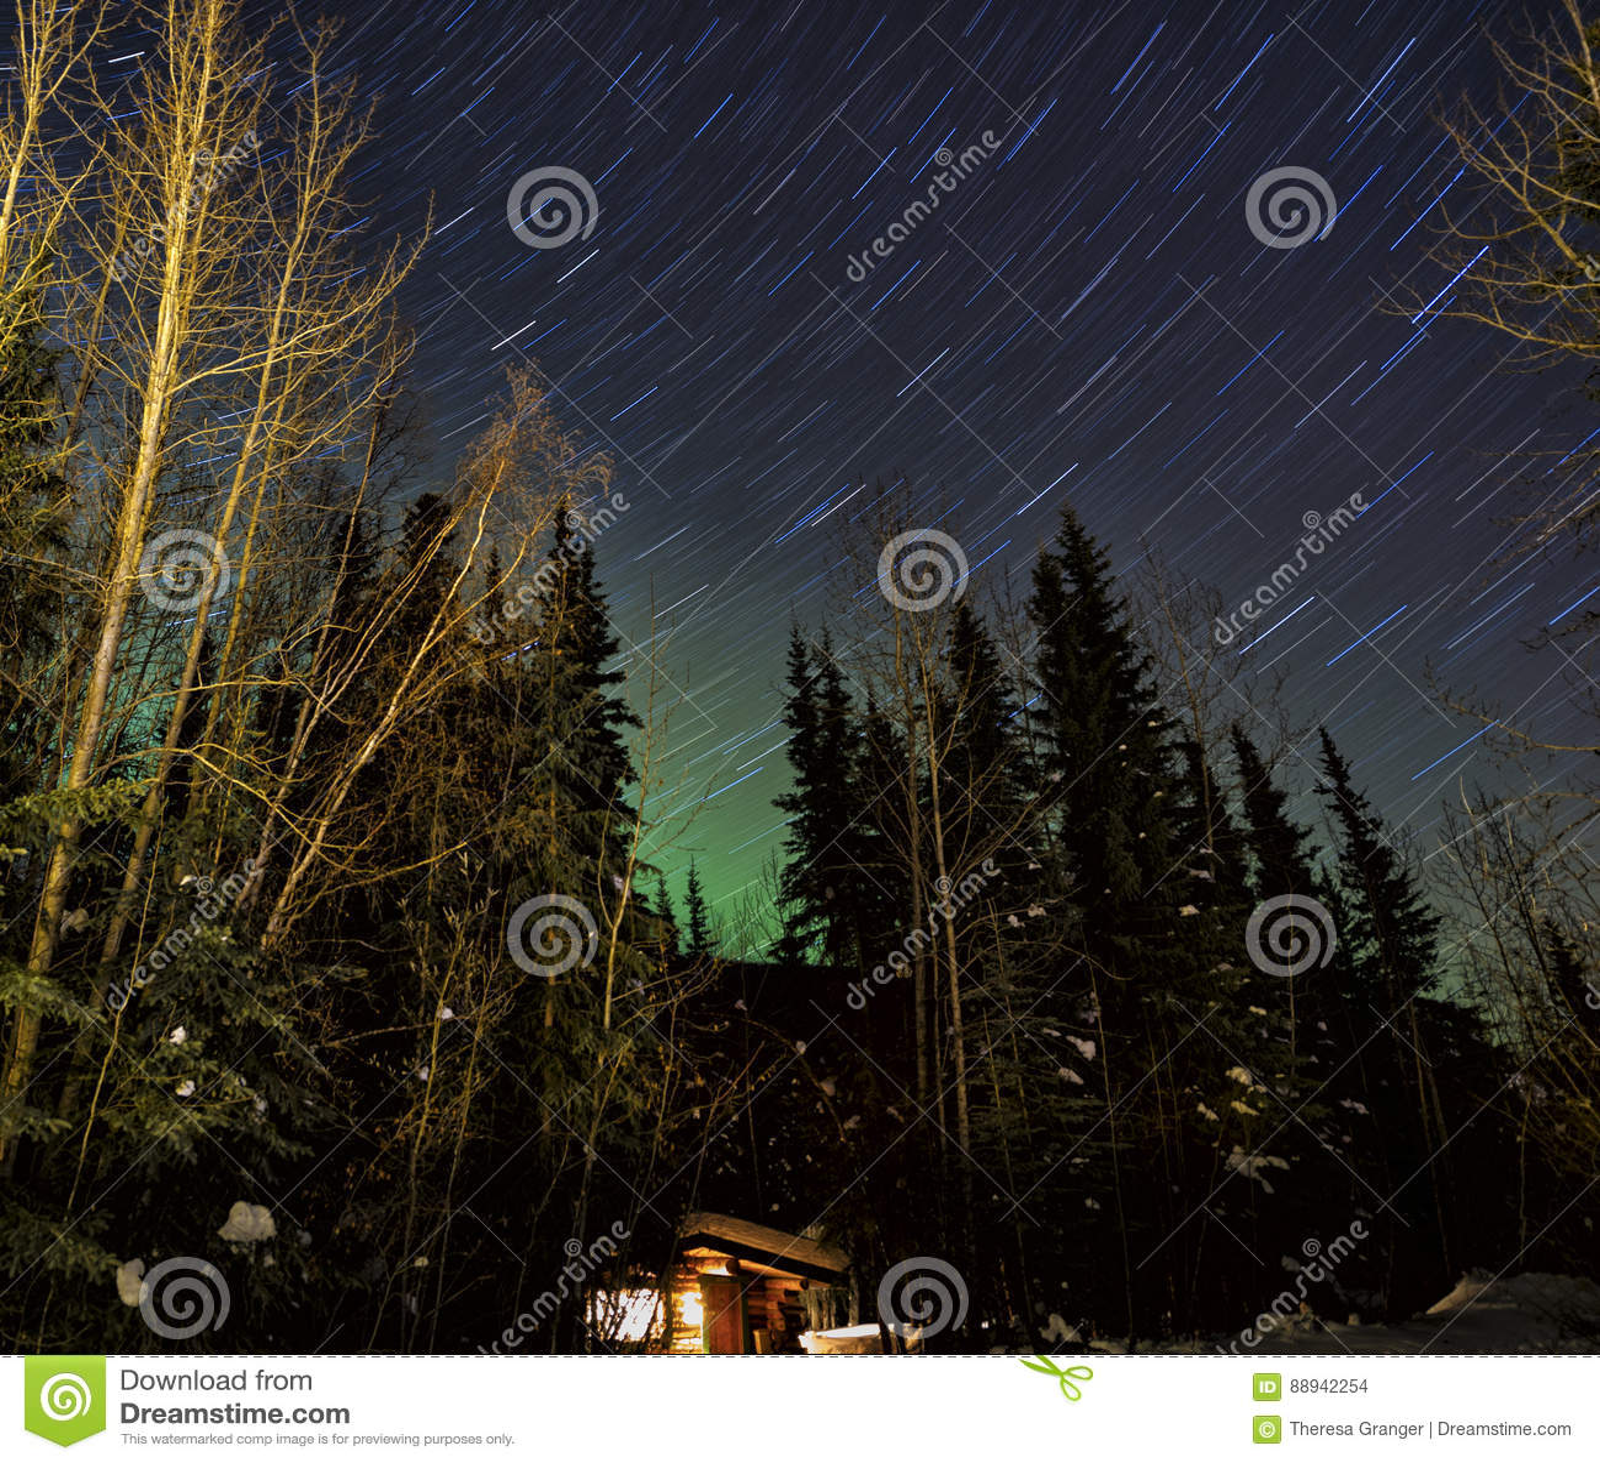 Aurora Sky Stock Photo. Image Of Bright, Glow, Phenomenon